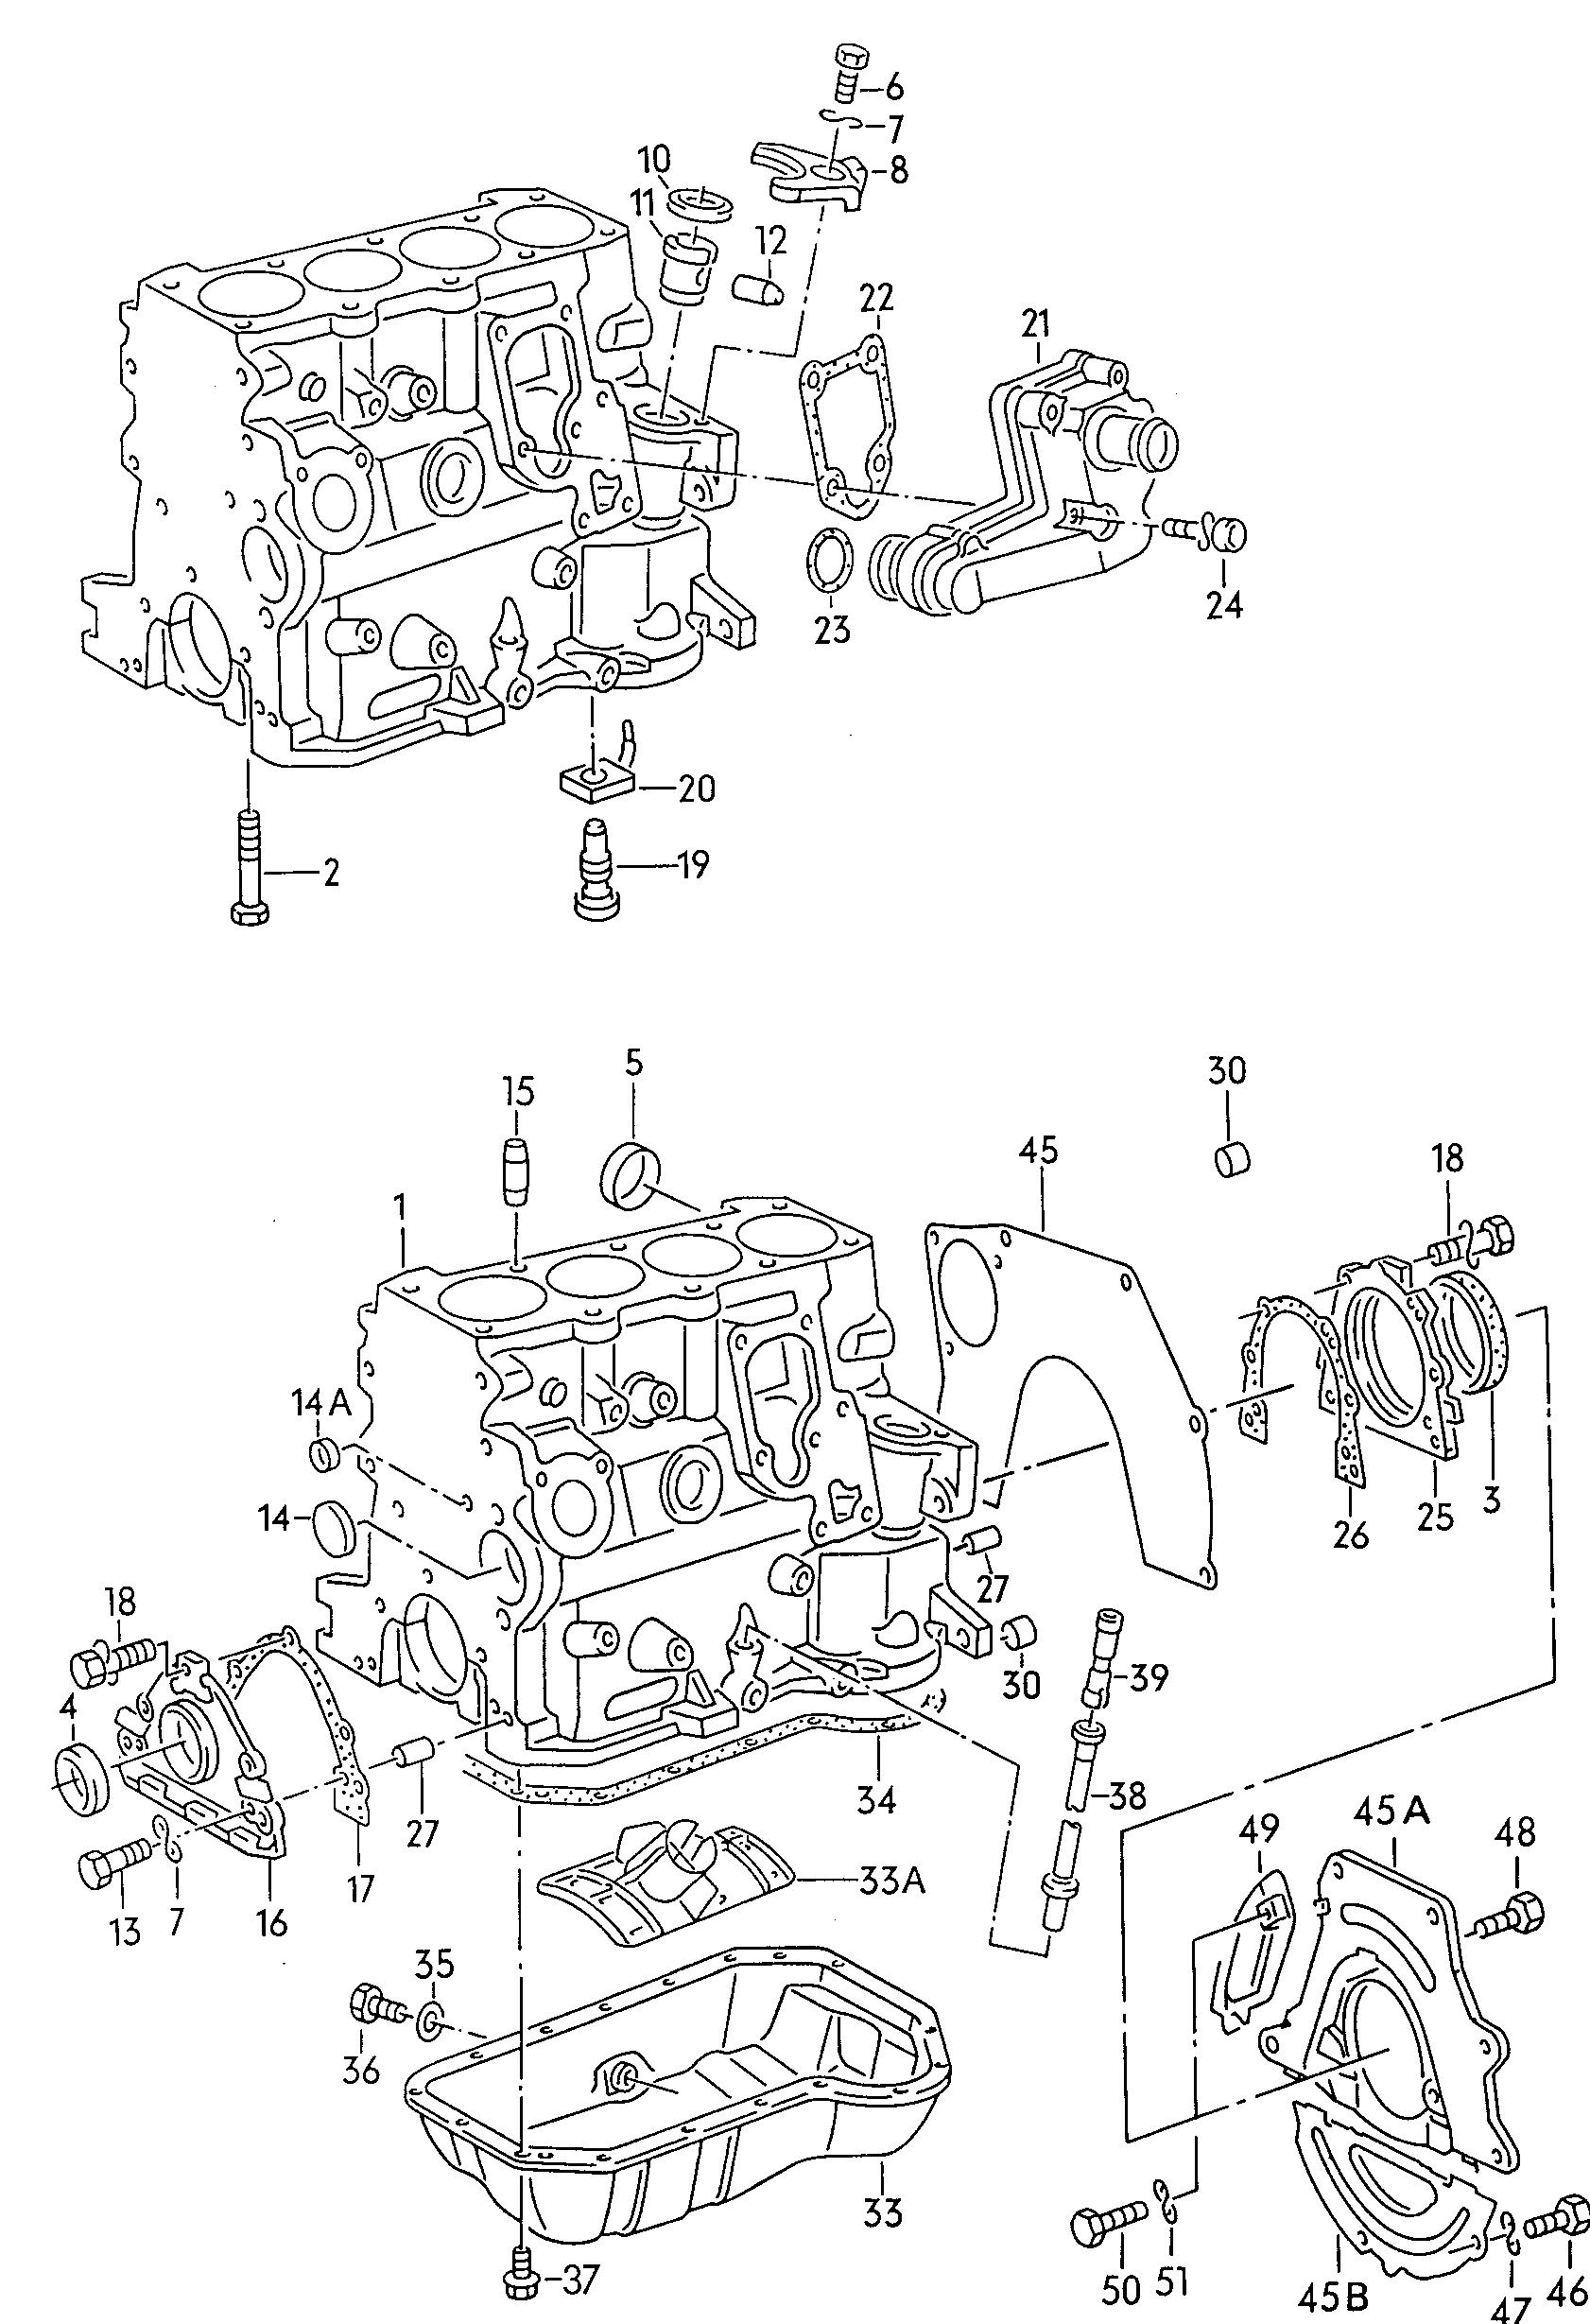 volkswagen golf cabrio 1996 1999 cylinder block with pistons oil sump vag etka online. Black Bedroom Furniture Sets. Home Design Ideas